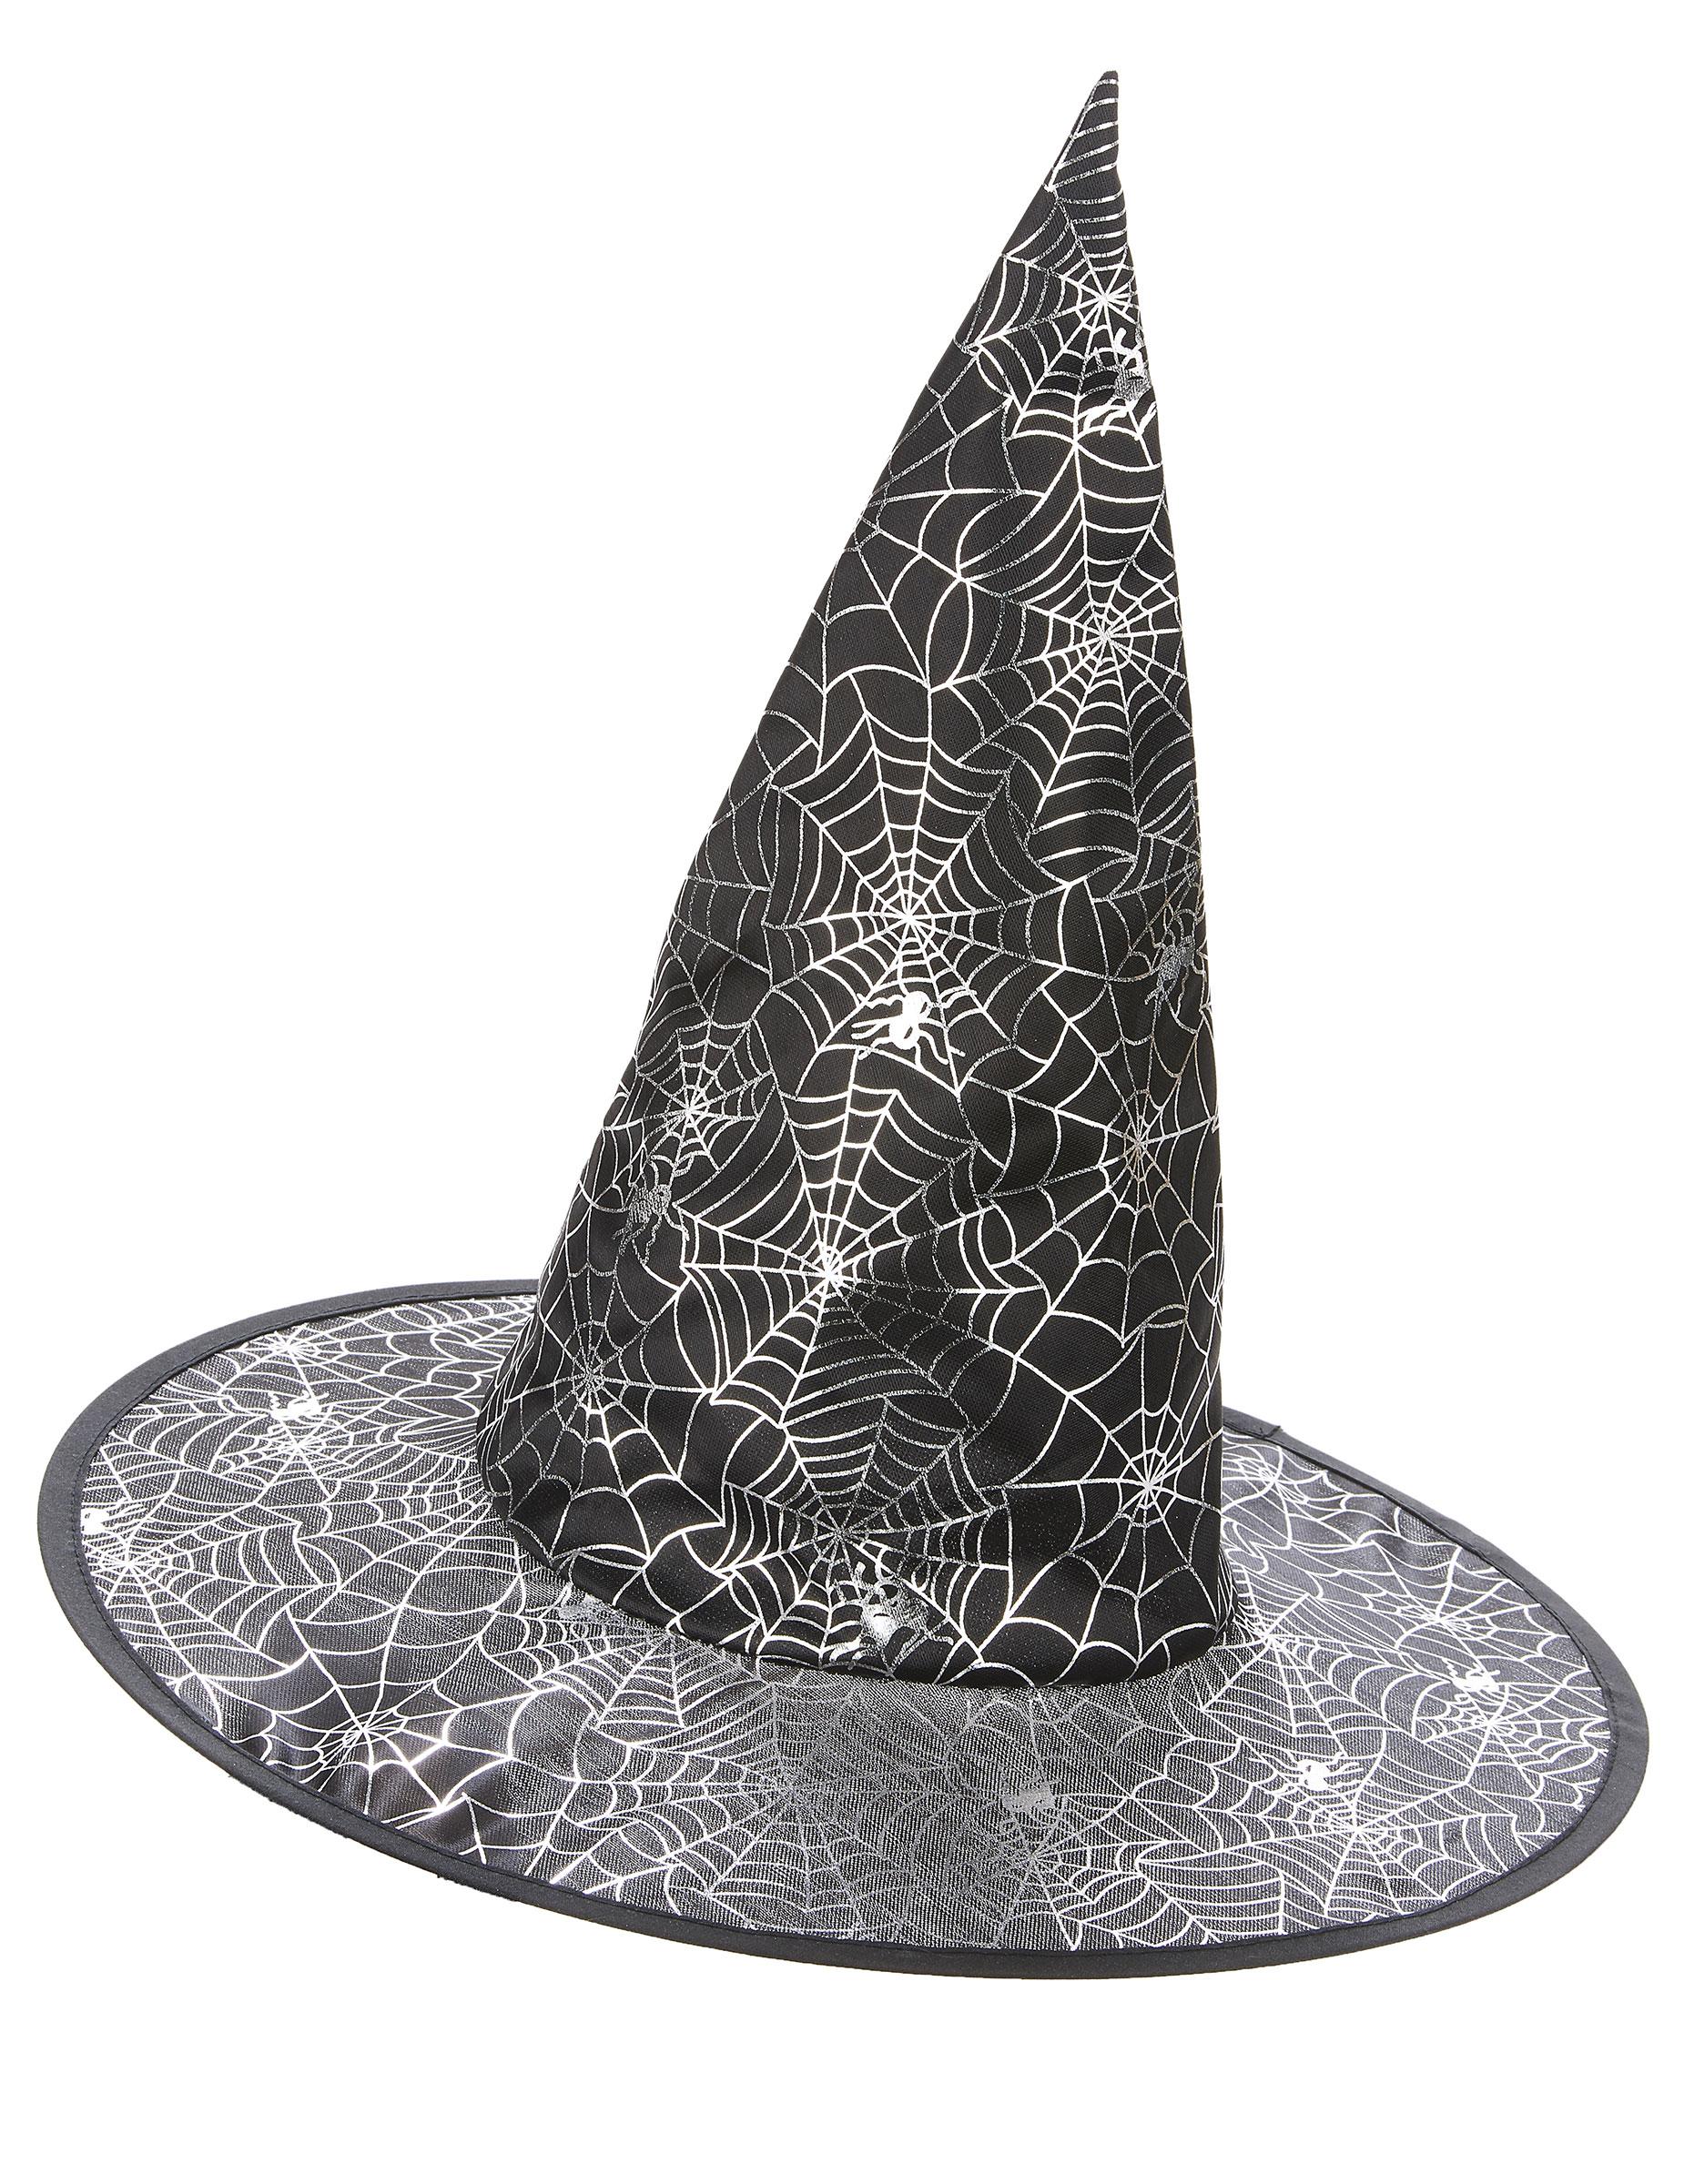 8d2b3c8e19c9a Chapéu de bruxa preto com teia de aranha branca adulto